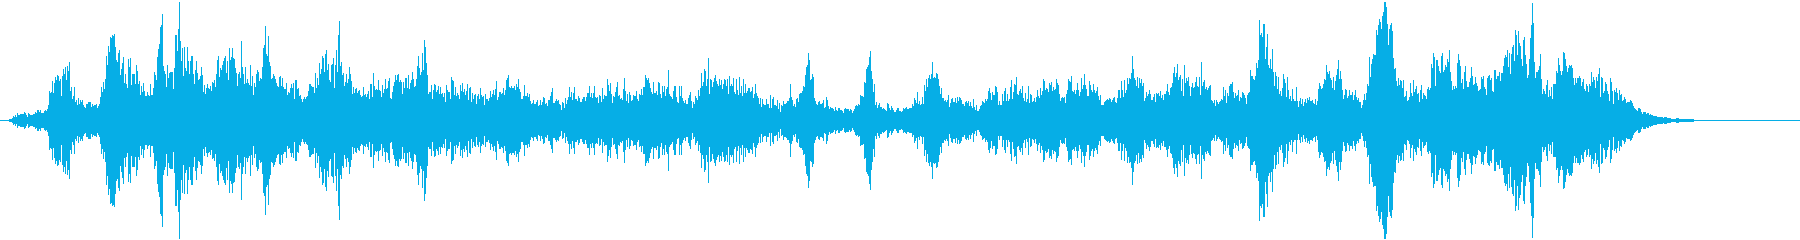 「HAHAHAHA」の再生済みの波形